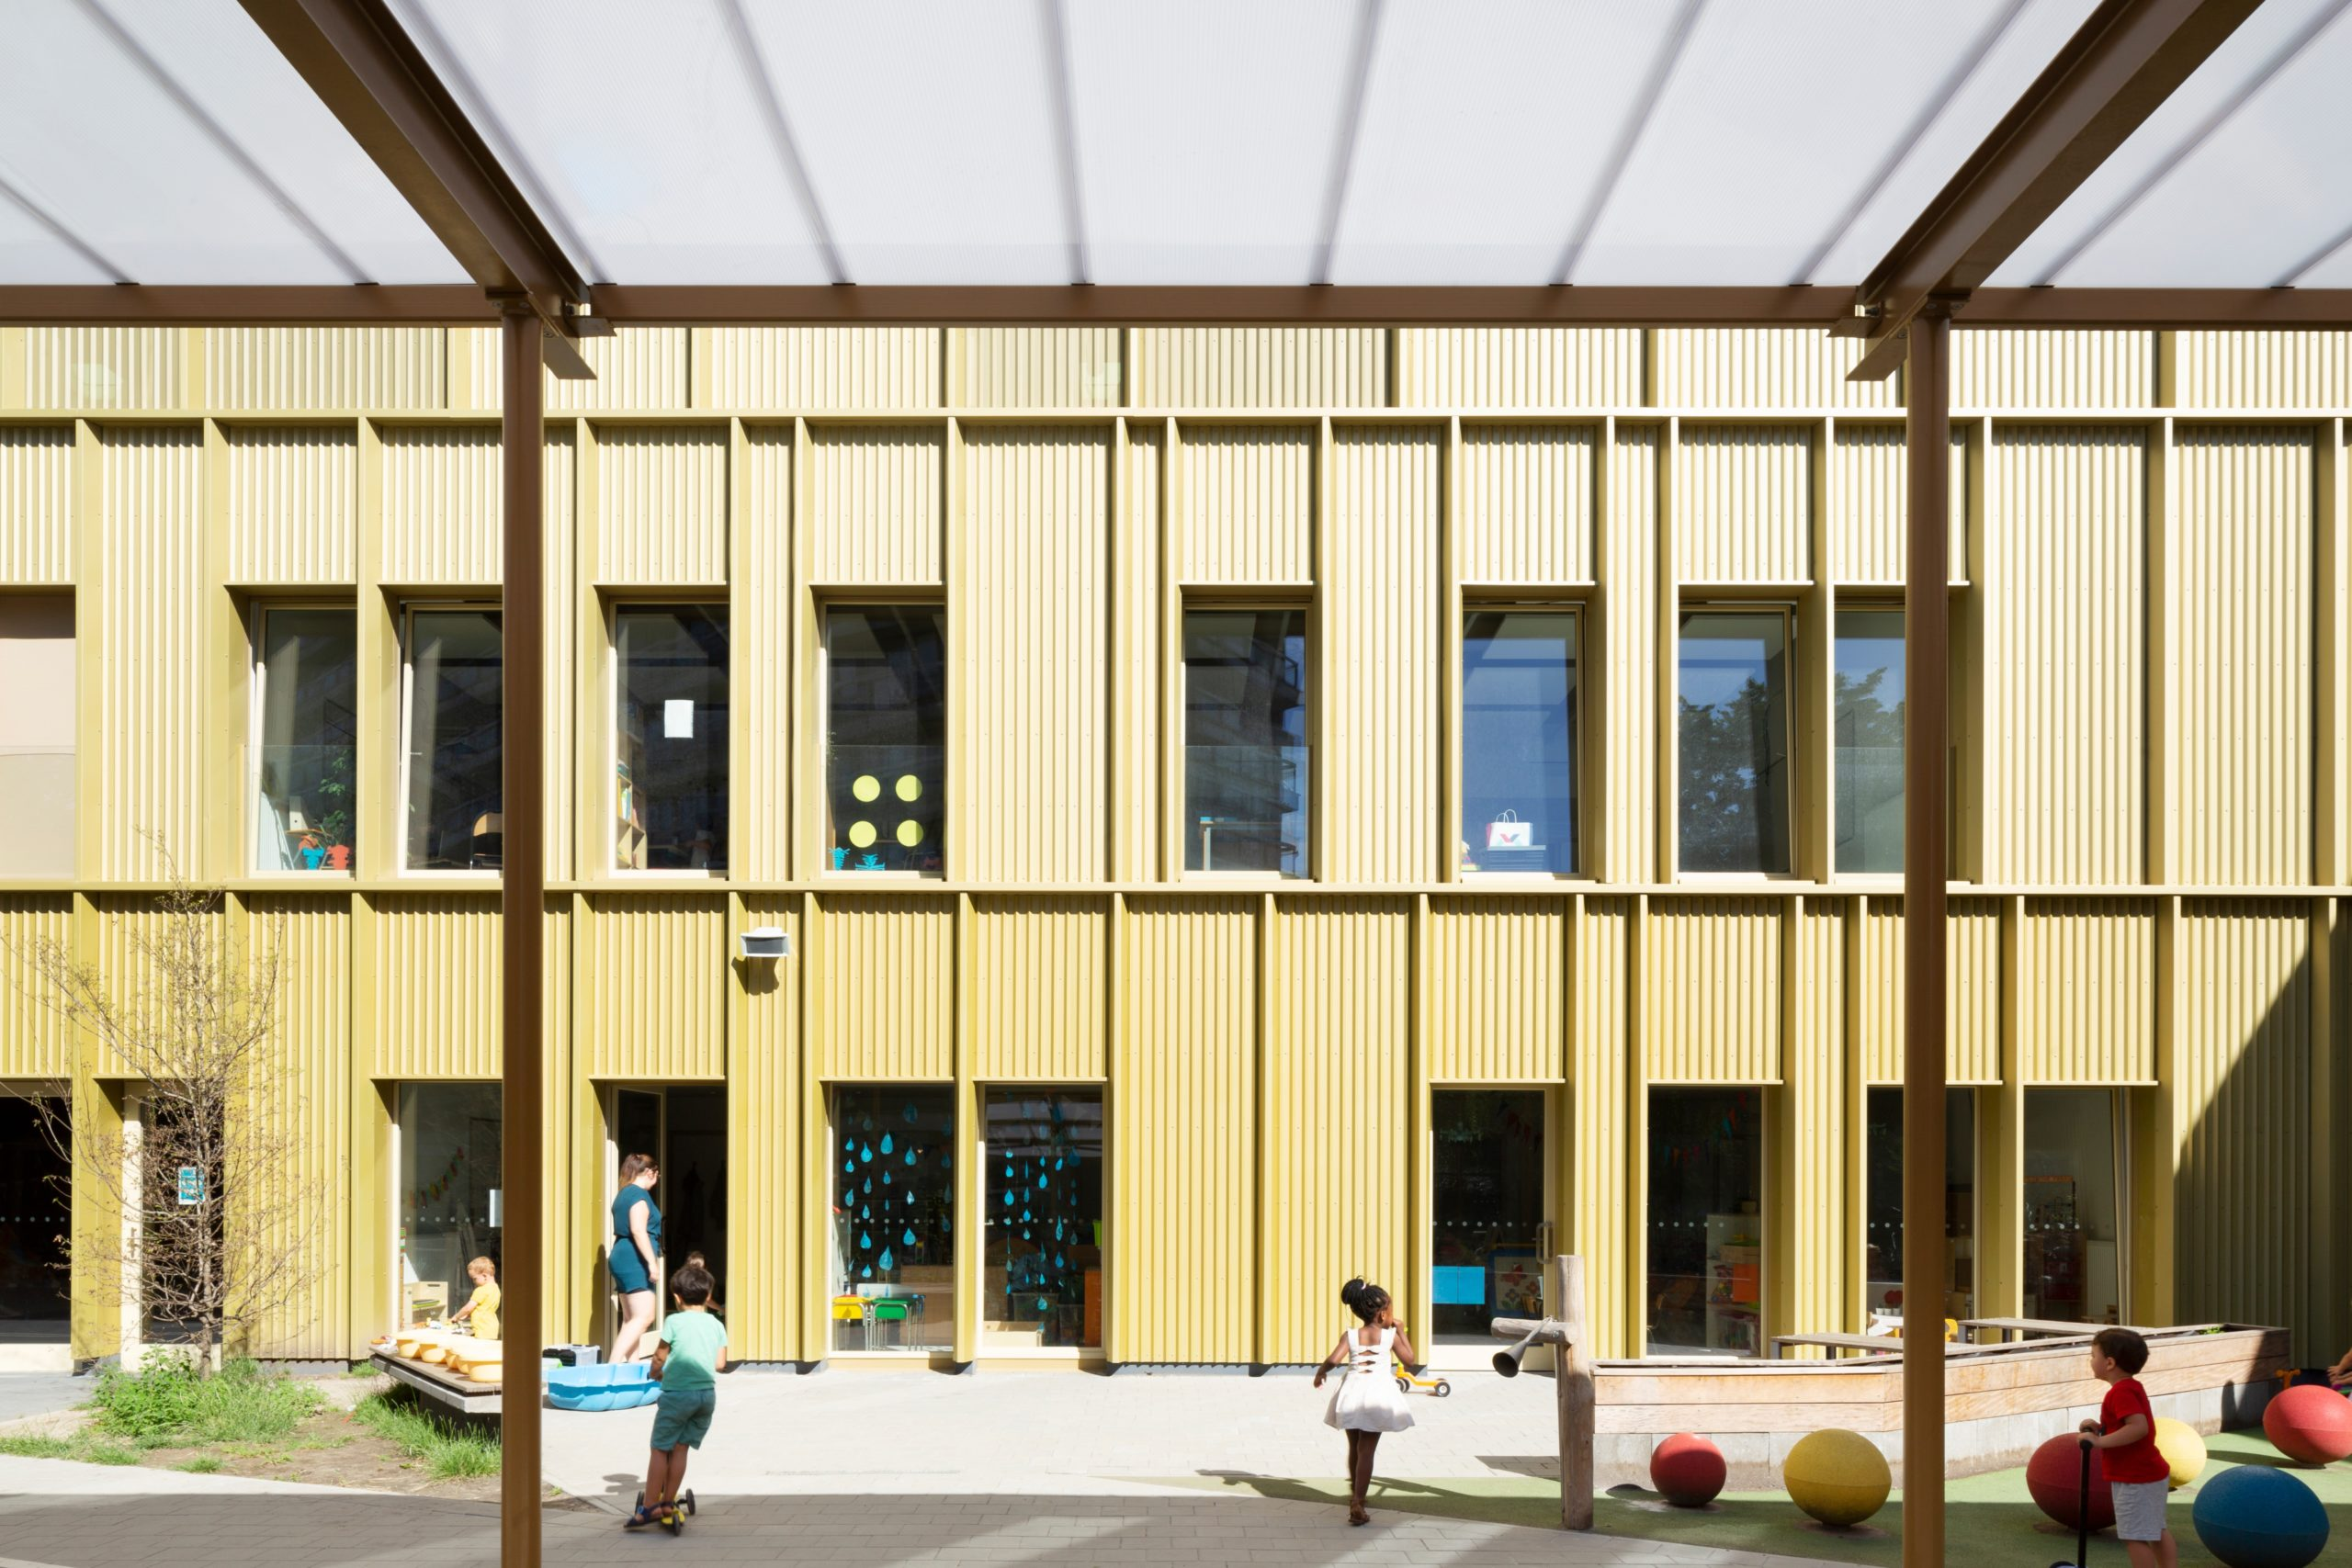 Pergola Ket & Co par OSK-AR Architecten, Sint-Jans-Molenbeek, Belgique